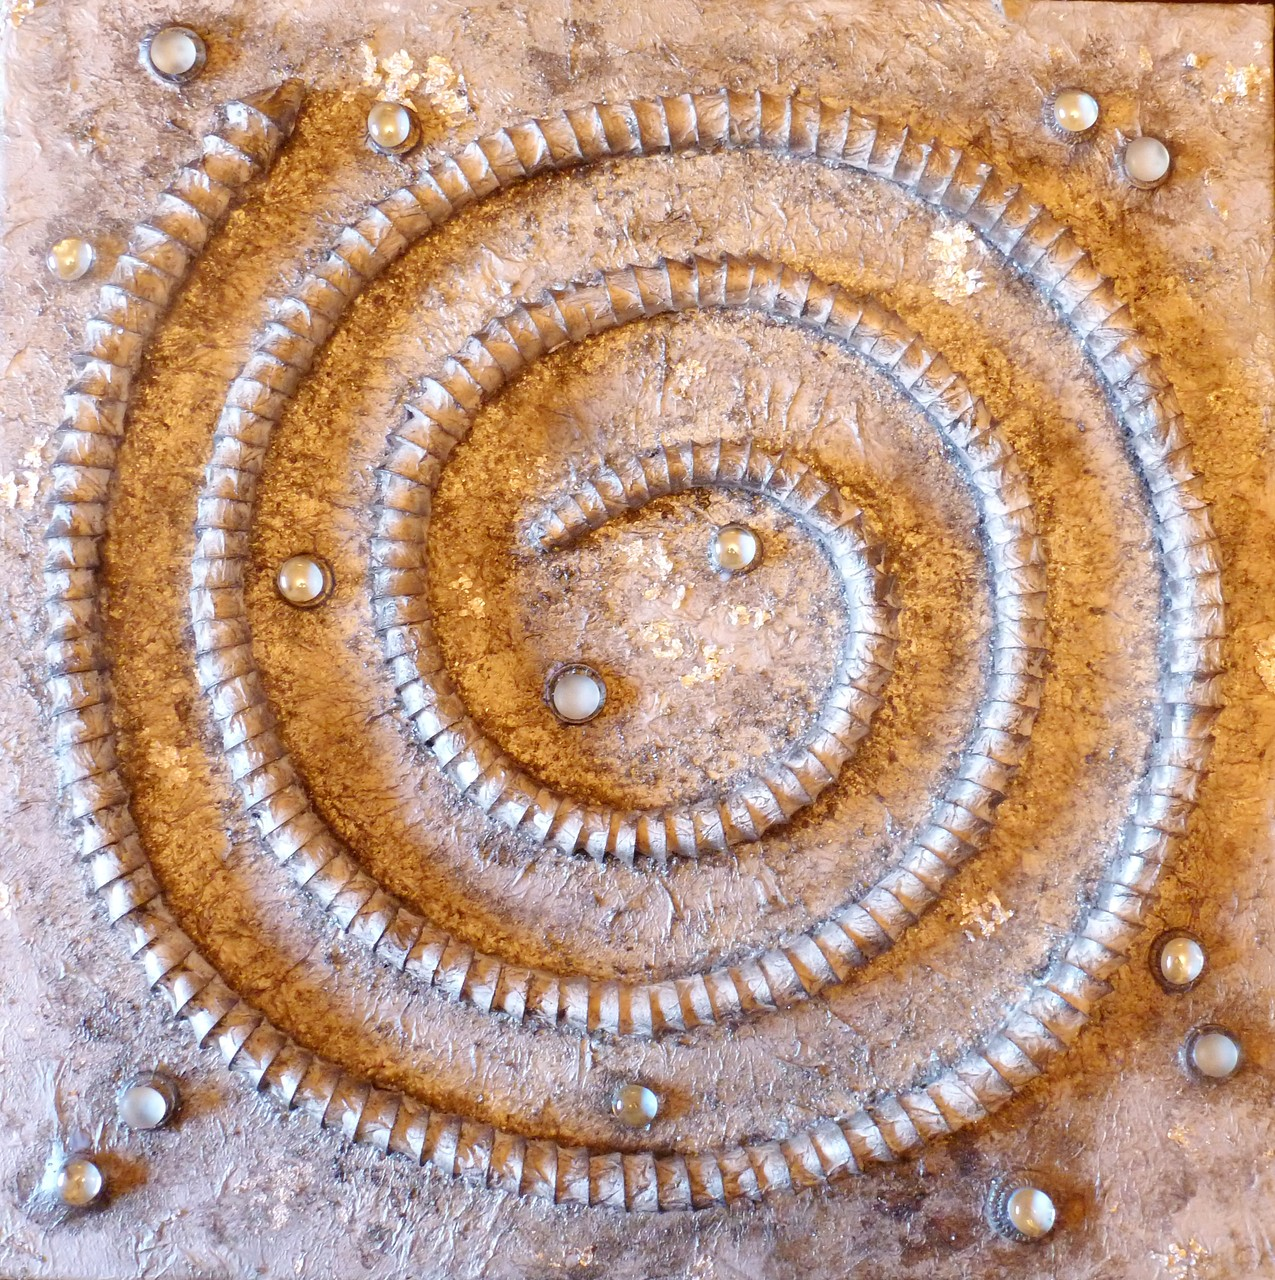 Industrielles Fossil (Assemblage auf Leinwand 60x60cm)